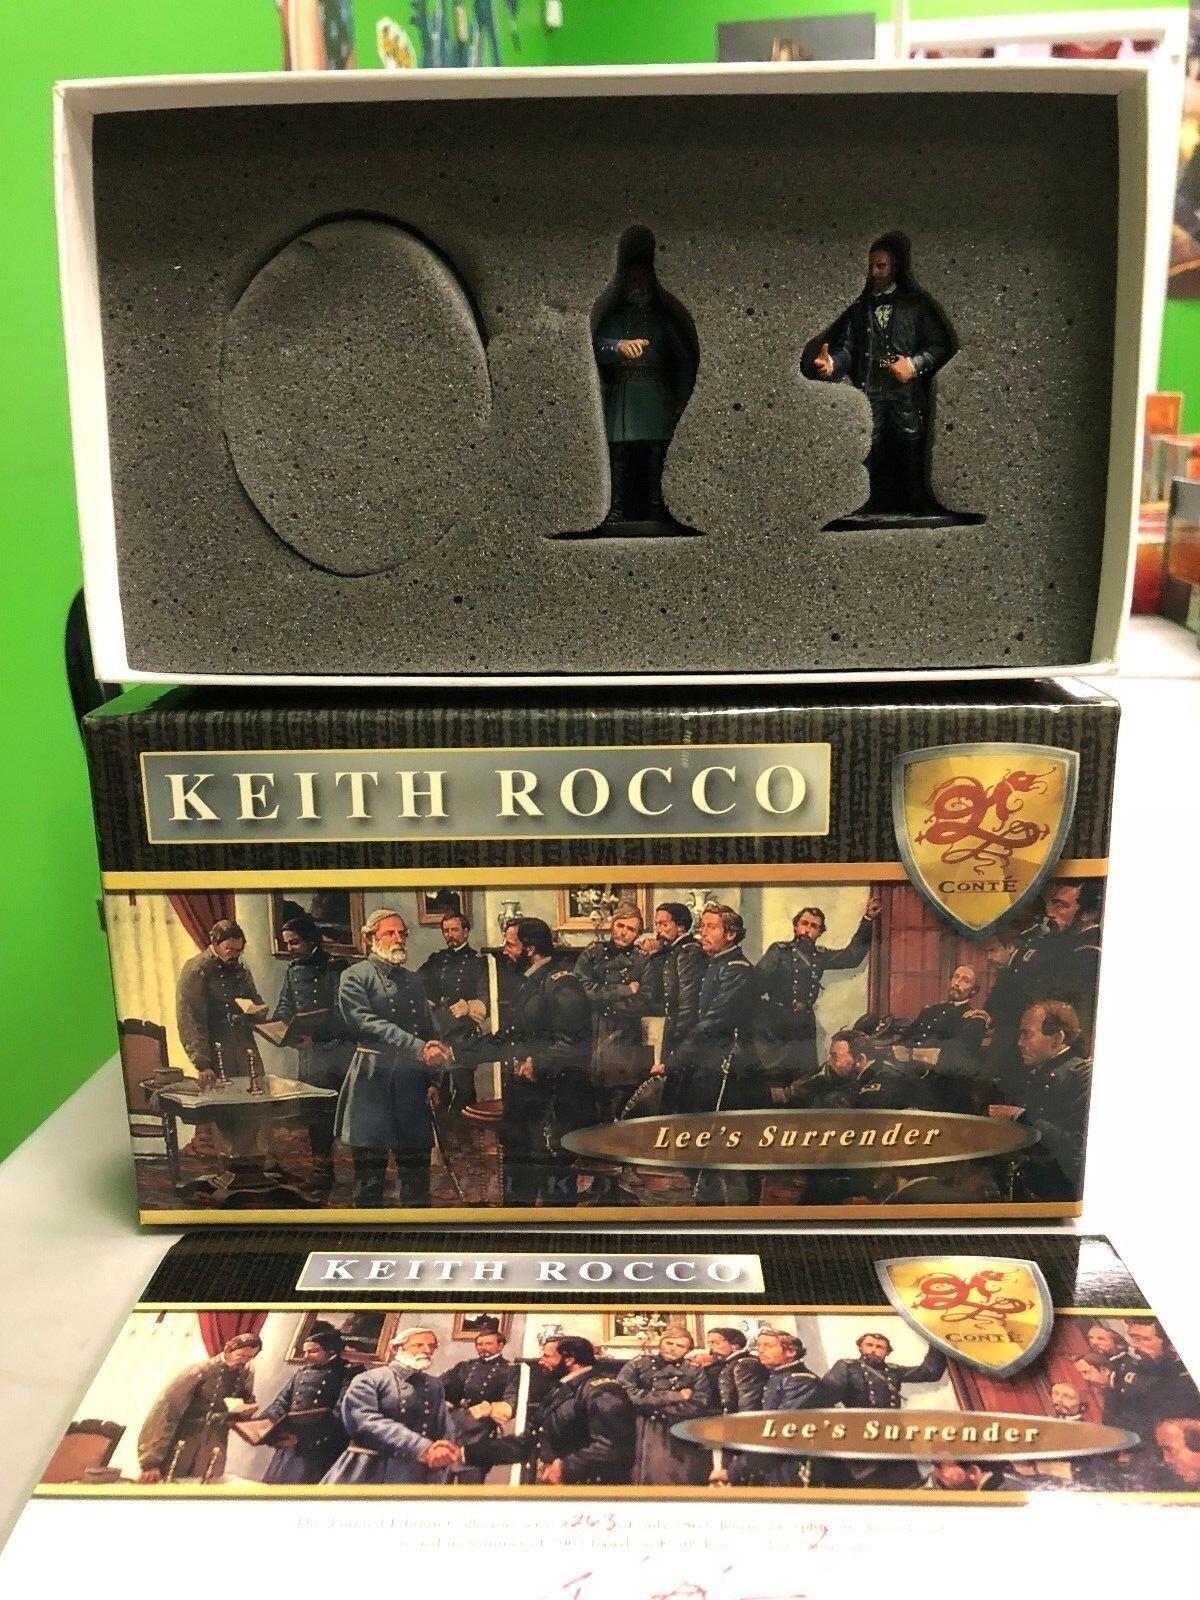 KEITH KEITH KEITH ROCCO CONTE COLLECTIBLES LEE'S SURRENDER  ROC007 OF 1863 LIMITED fe2129